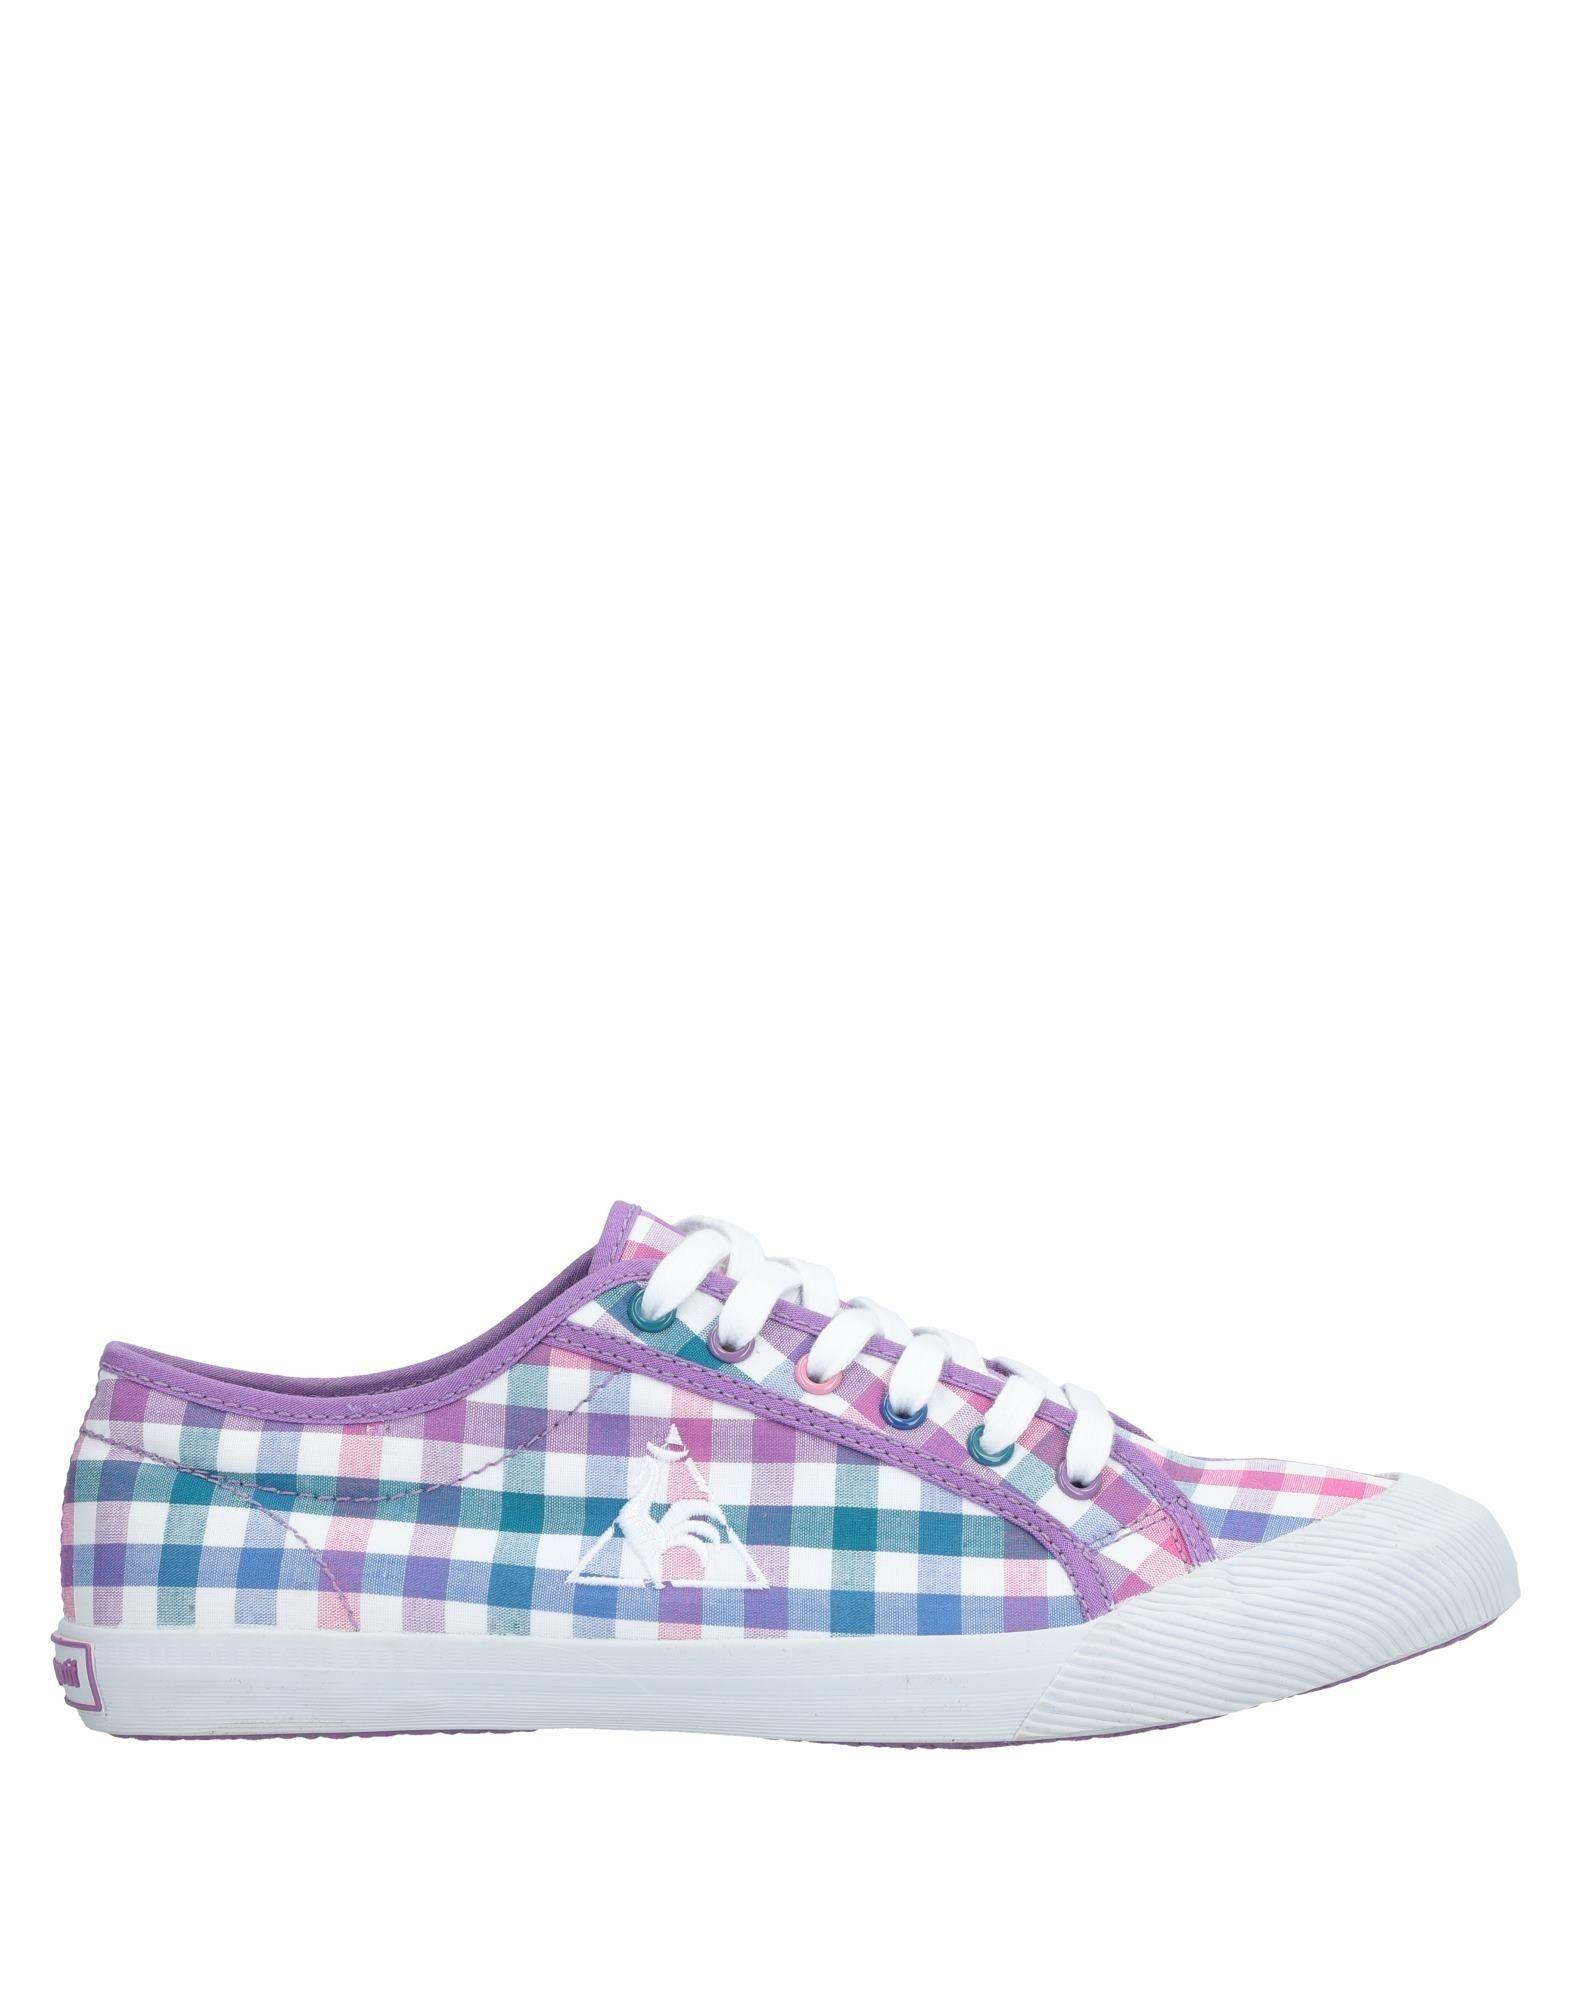 Sneakers Le Coq Sportif Donna - 11539059FP